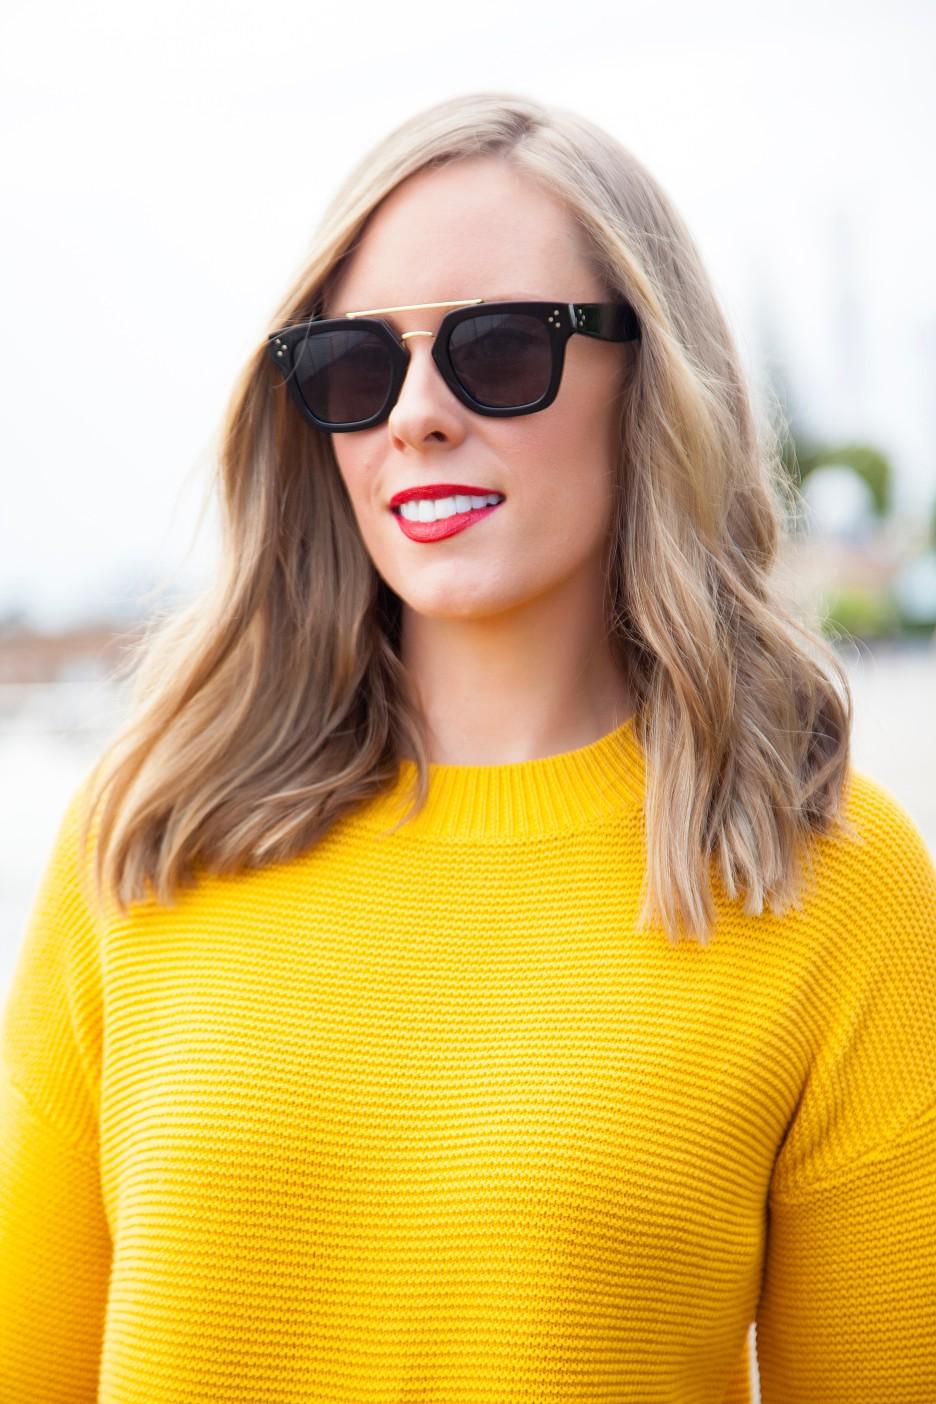 Style-Elixir-blog-Lauren-Slade-marigold-fashion-trend-style-outfit-ideas-3